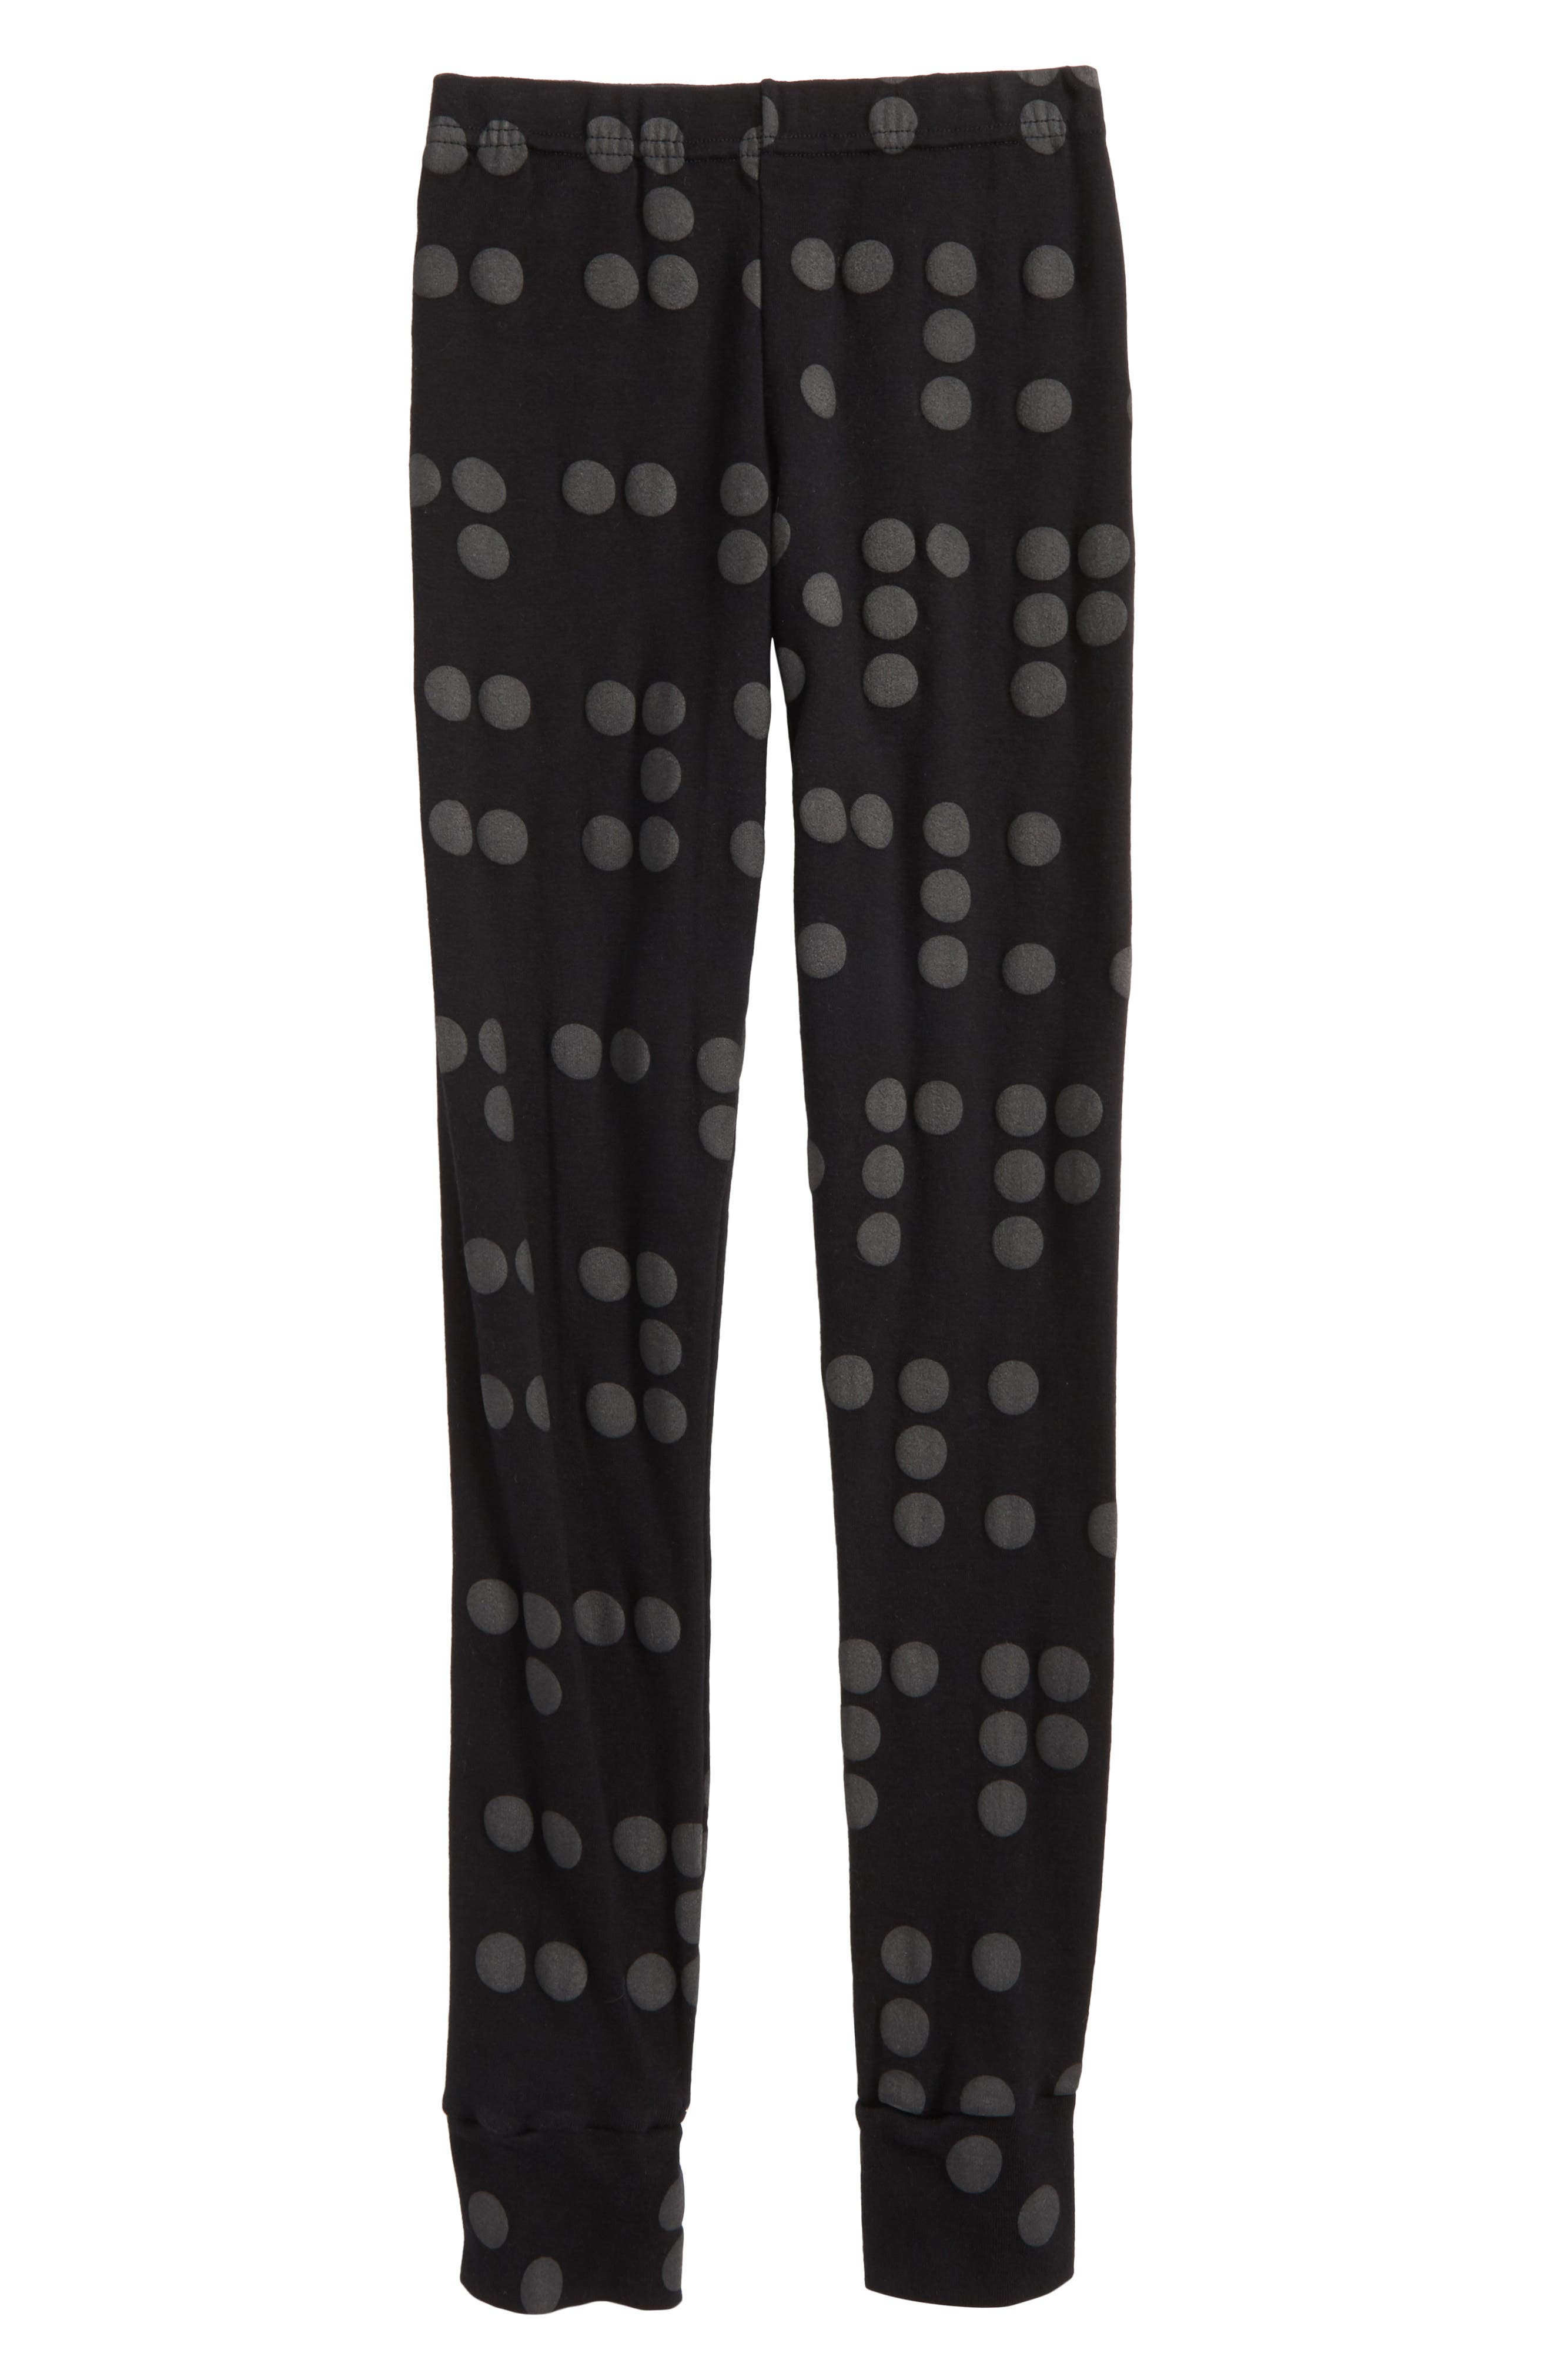 Braille Dot Leggings,                             Main thumbnail 1, color,                             001